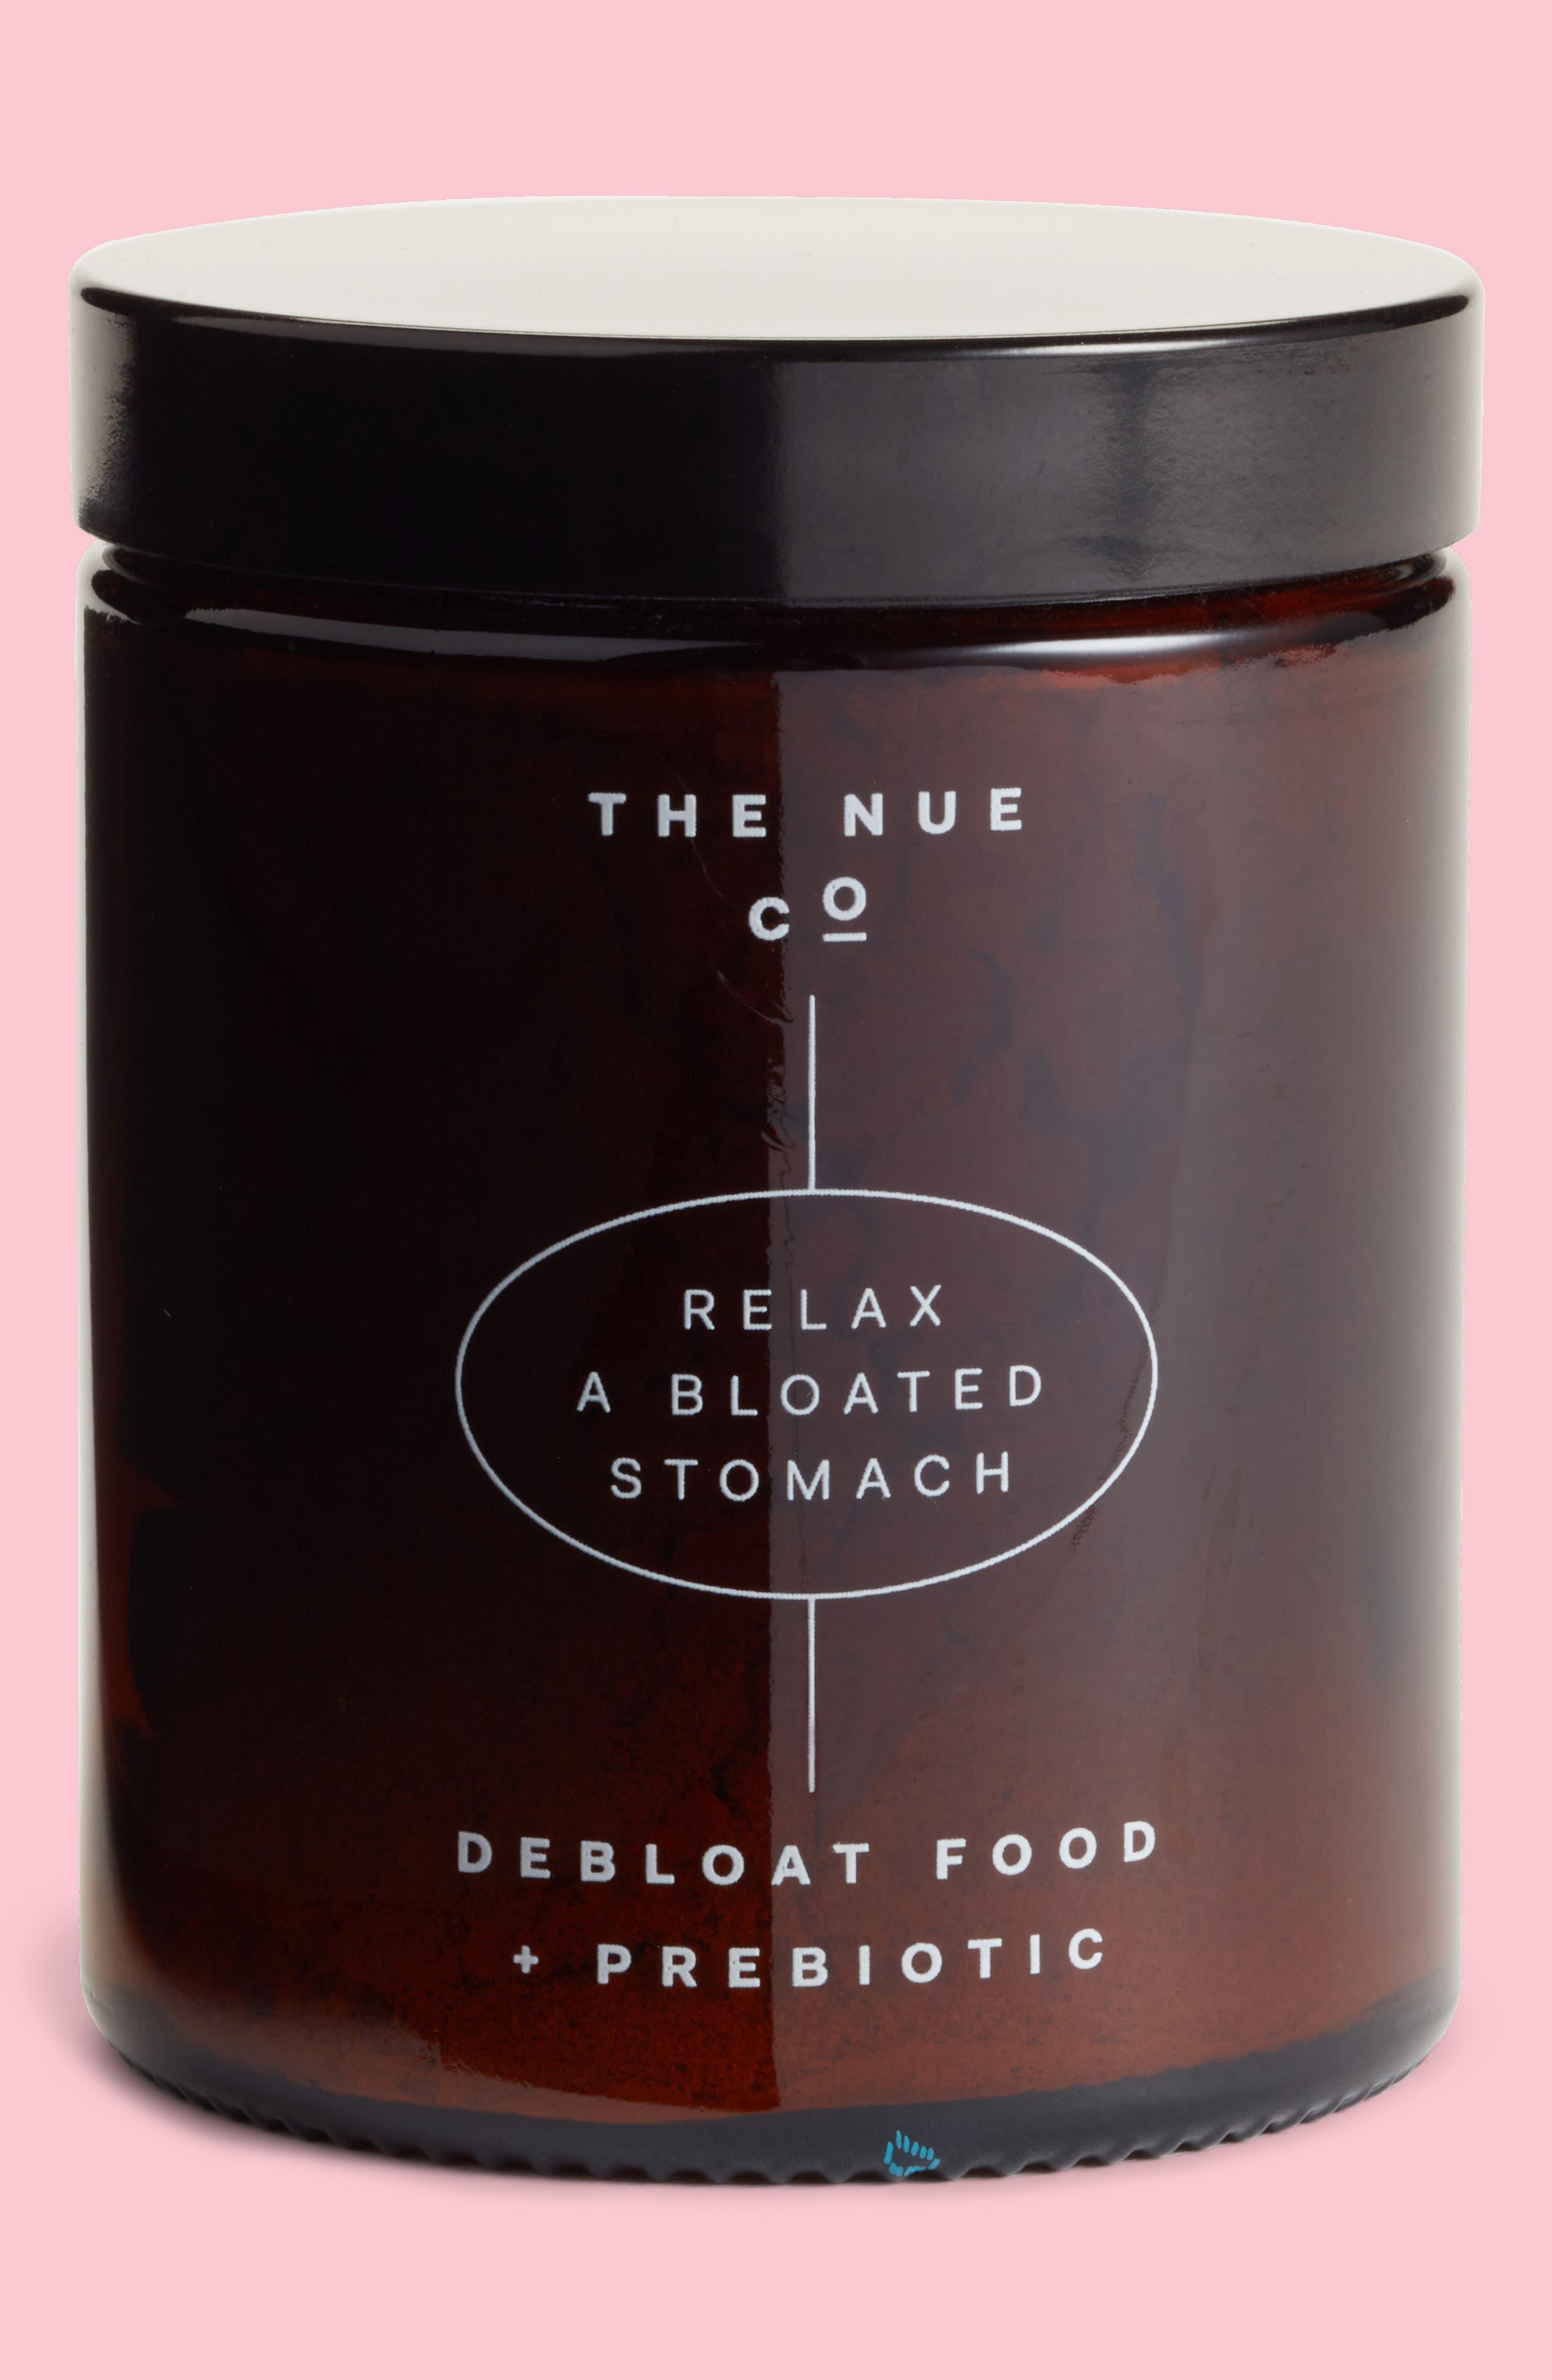 Debloat Food + Prebiotic Dietary Supplement,                             Main thumbnail 1, color,                             None